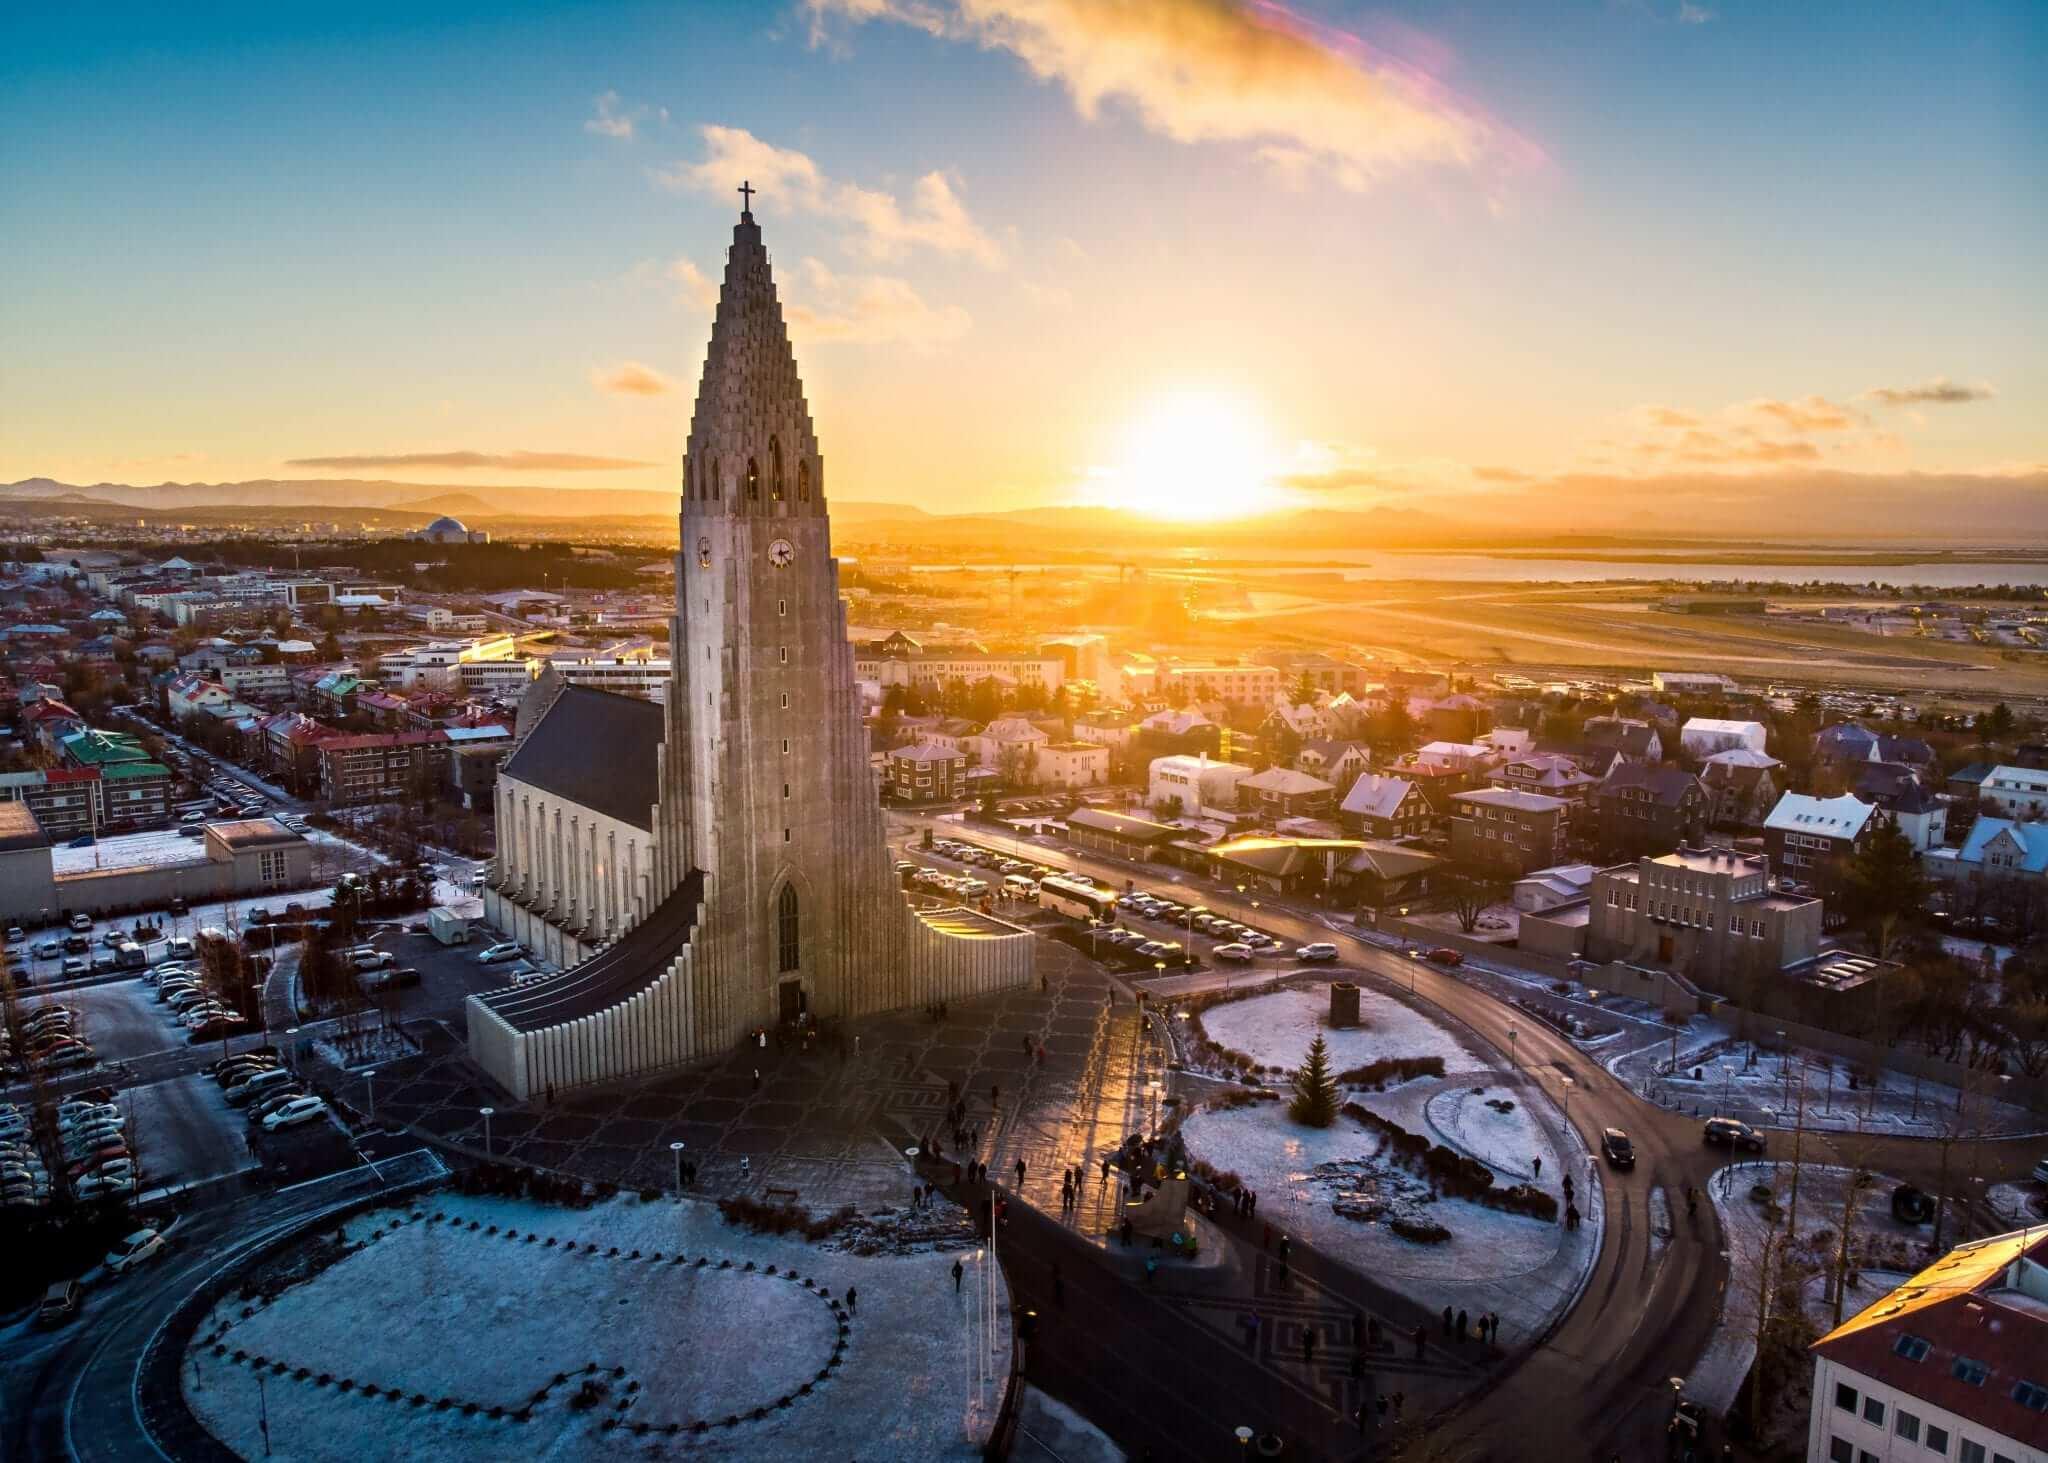 The Midnight Sun shines behind one of Iceland's most famous monuments, Hallgrímskirkja church.